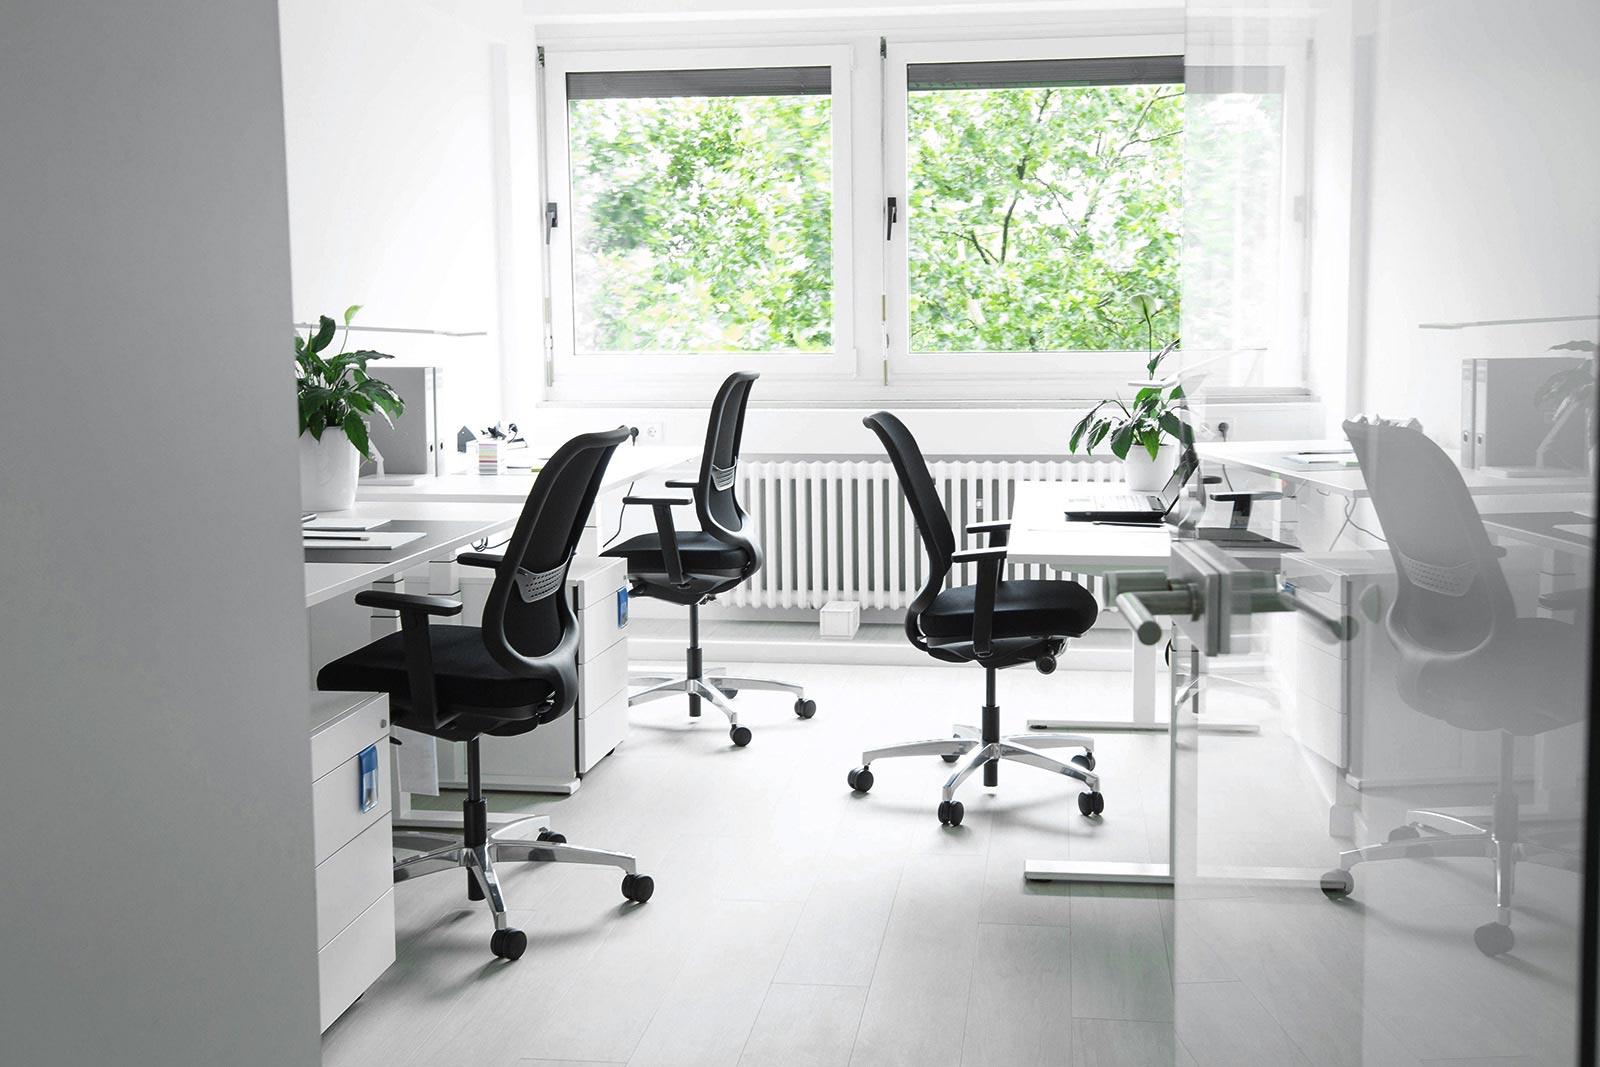 Mannheim Offices Büro